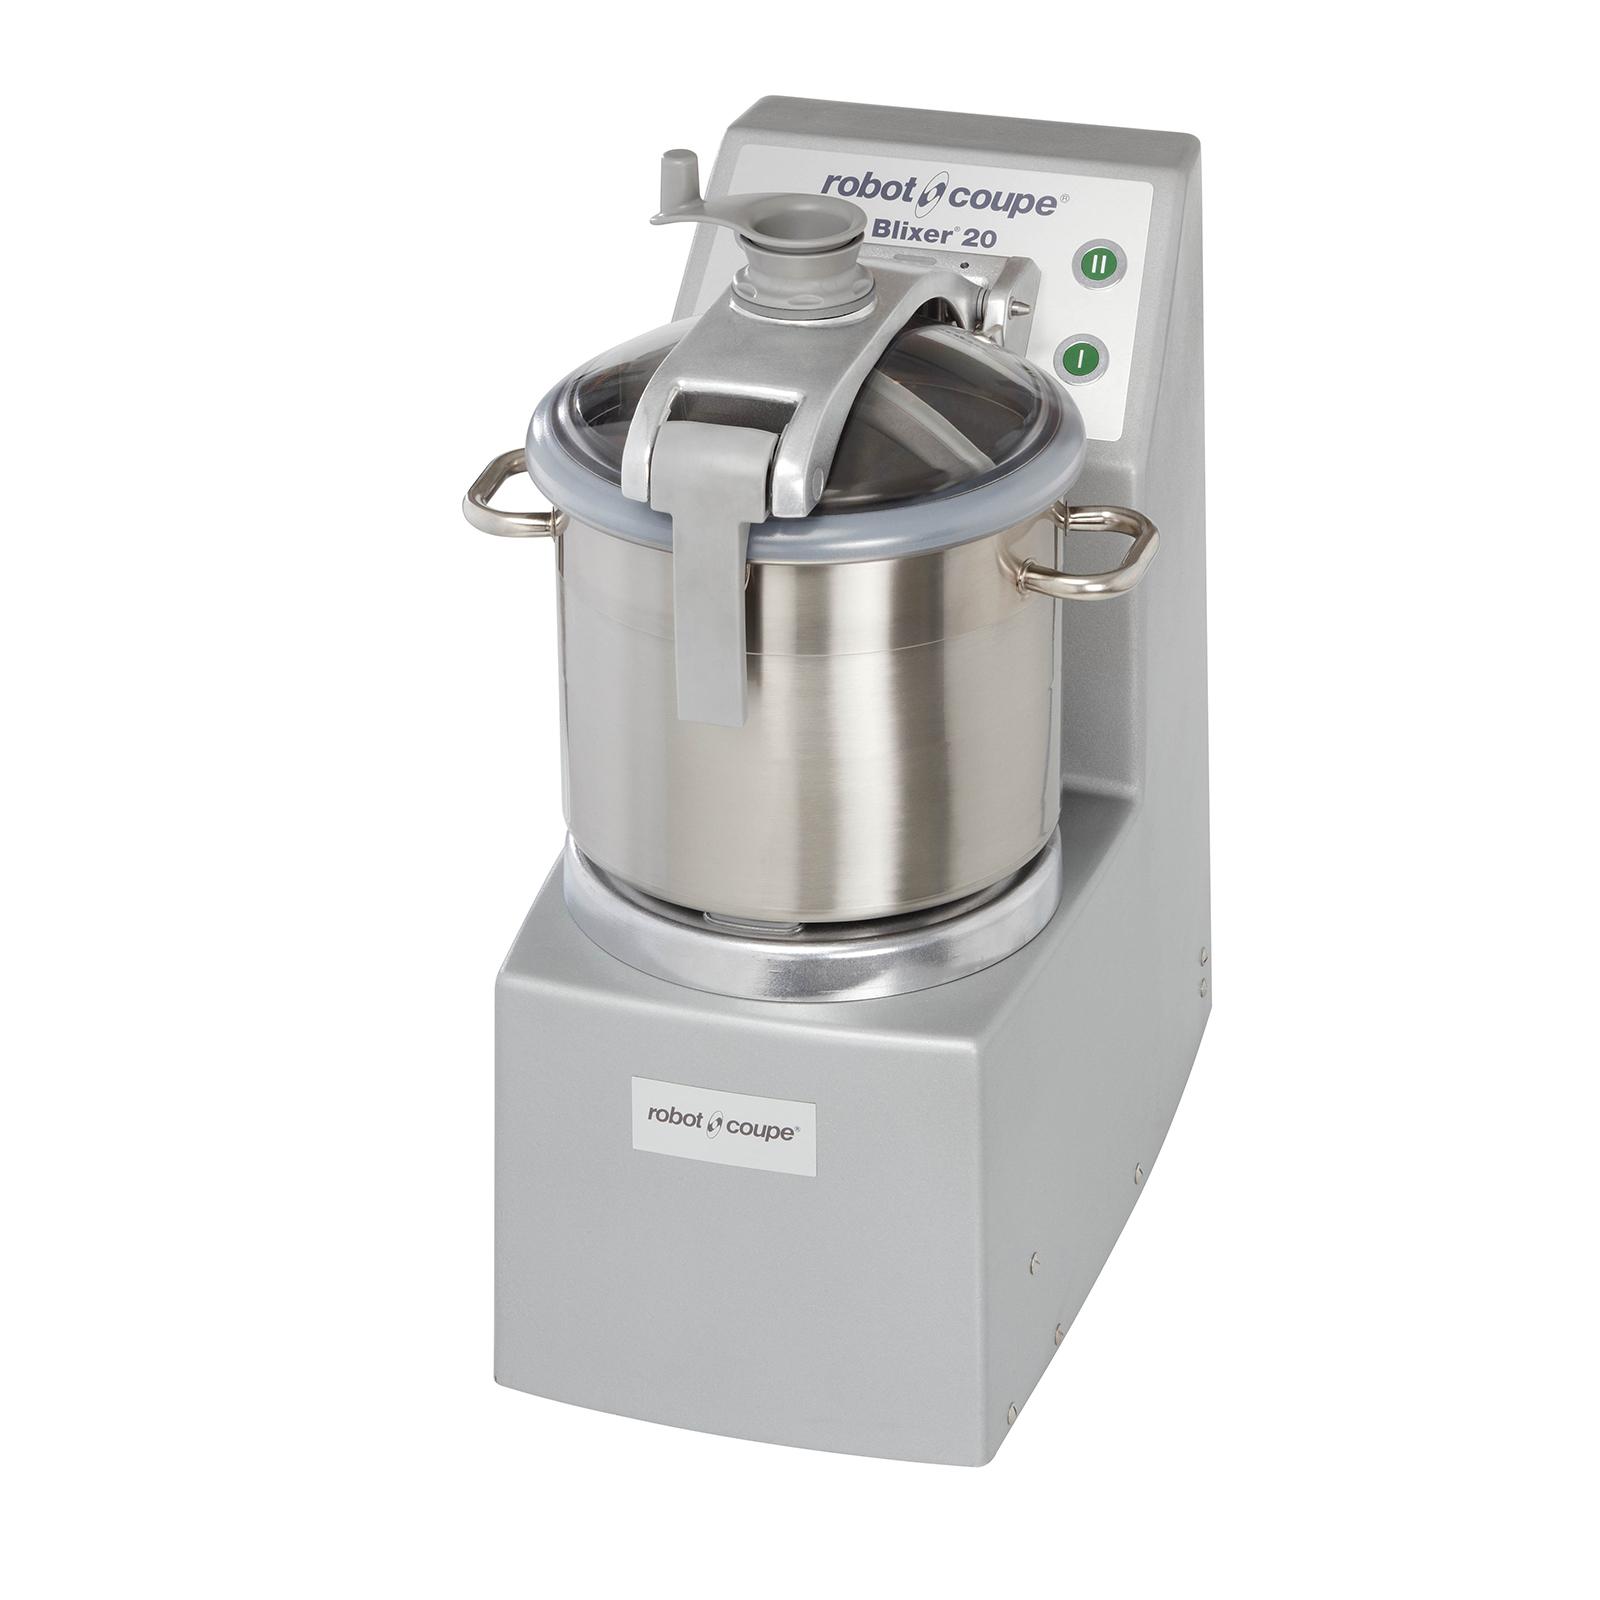 Robot Coupe BLIXER 20 food processor, benchtop / countertop